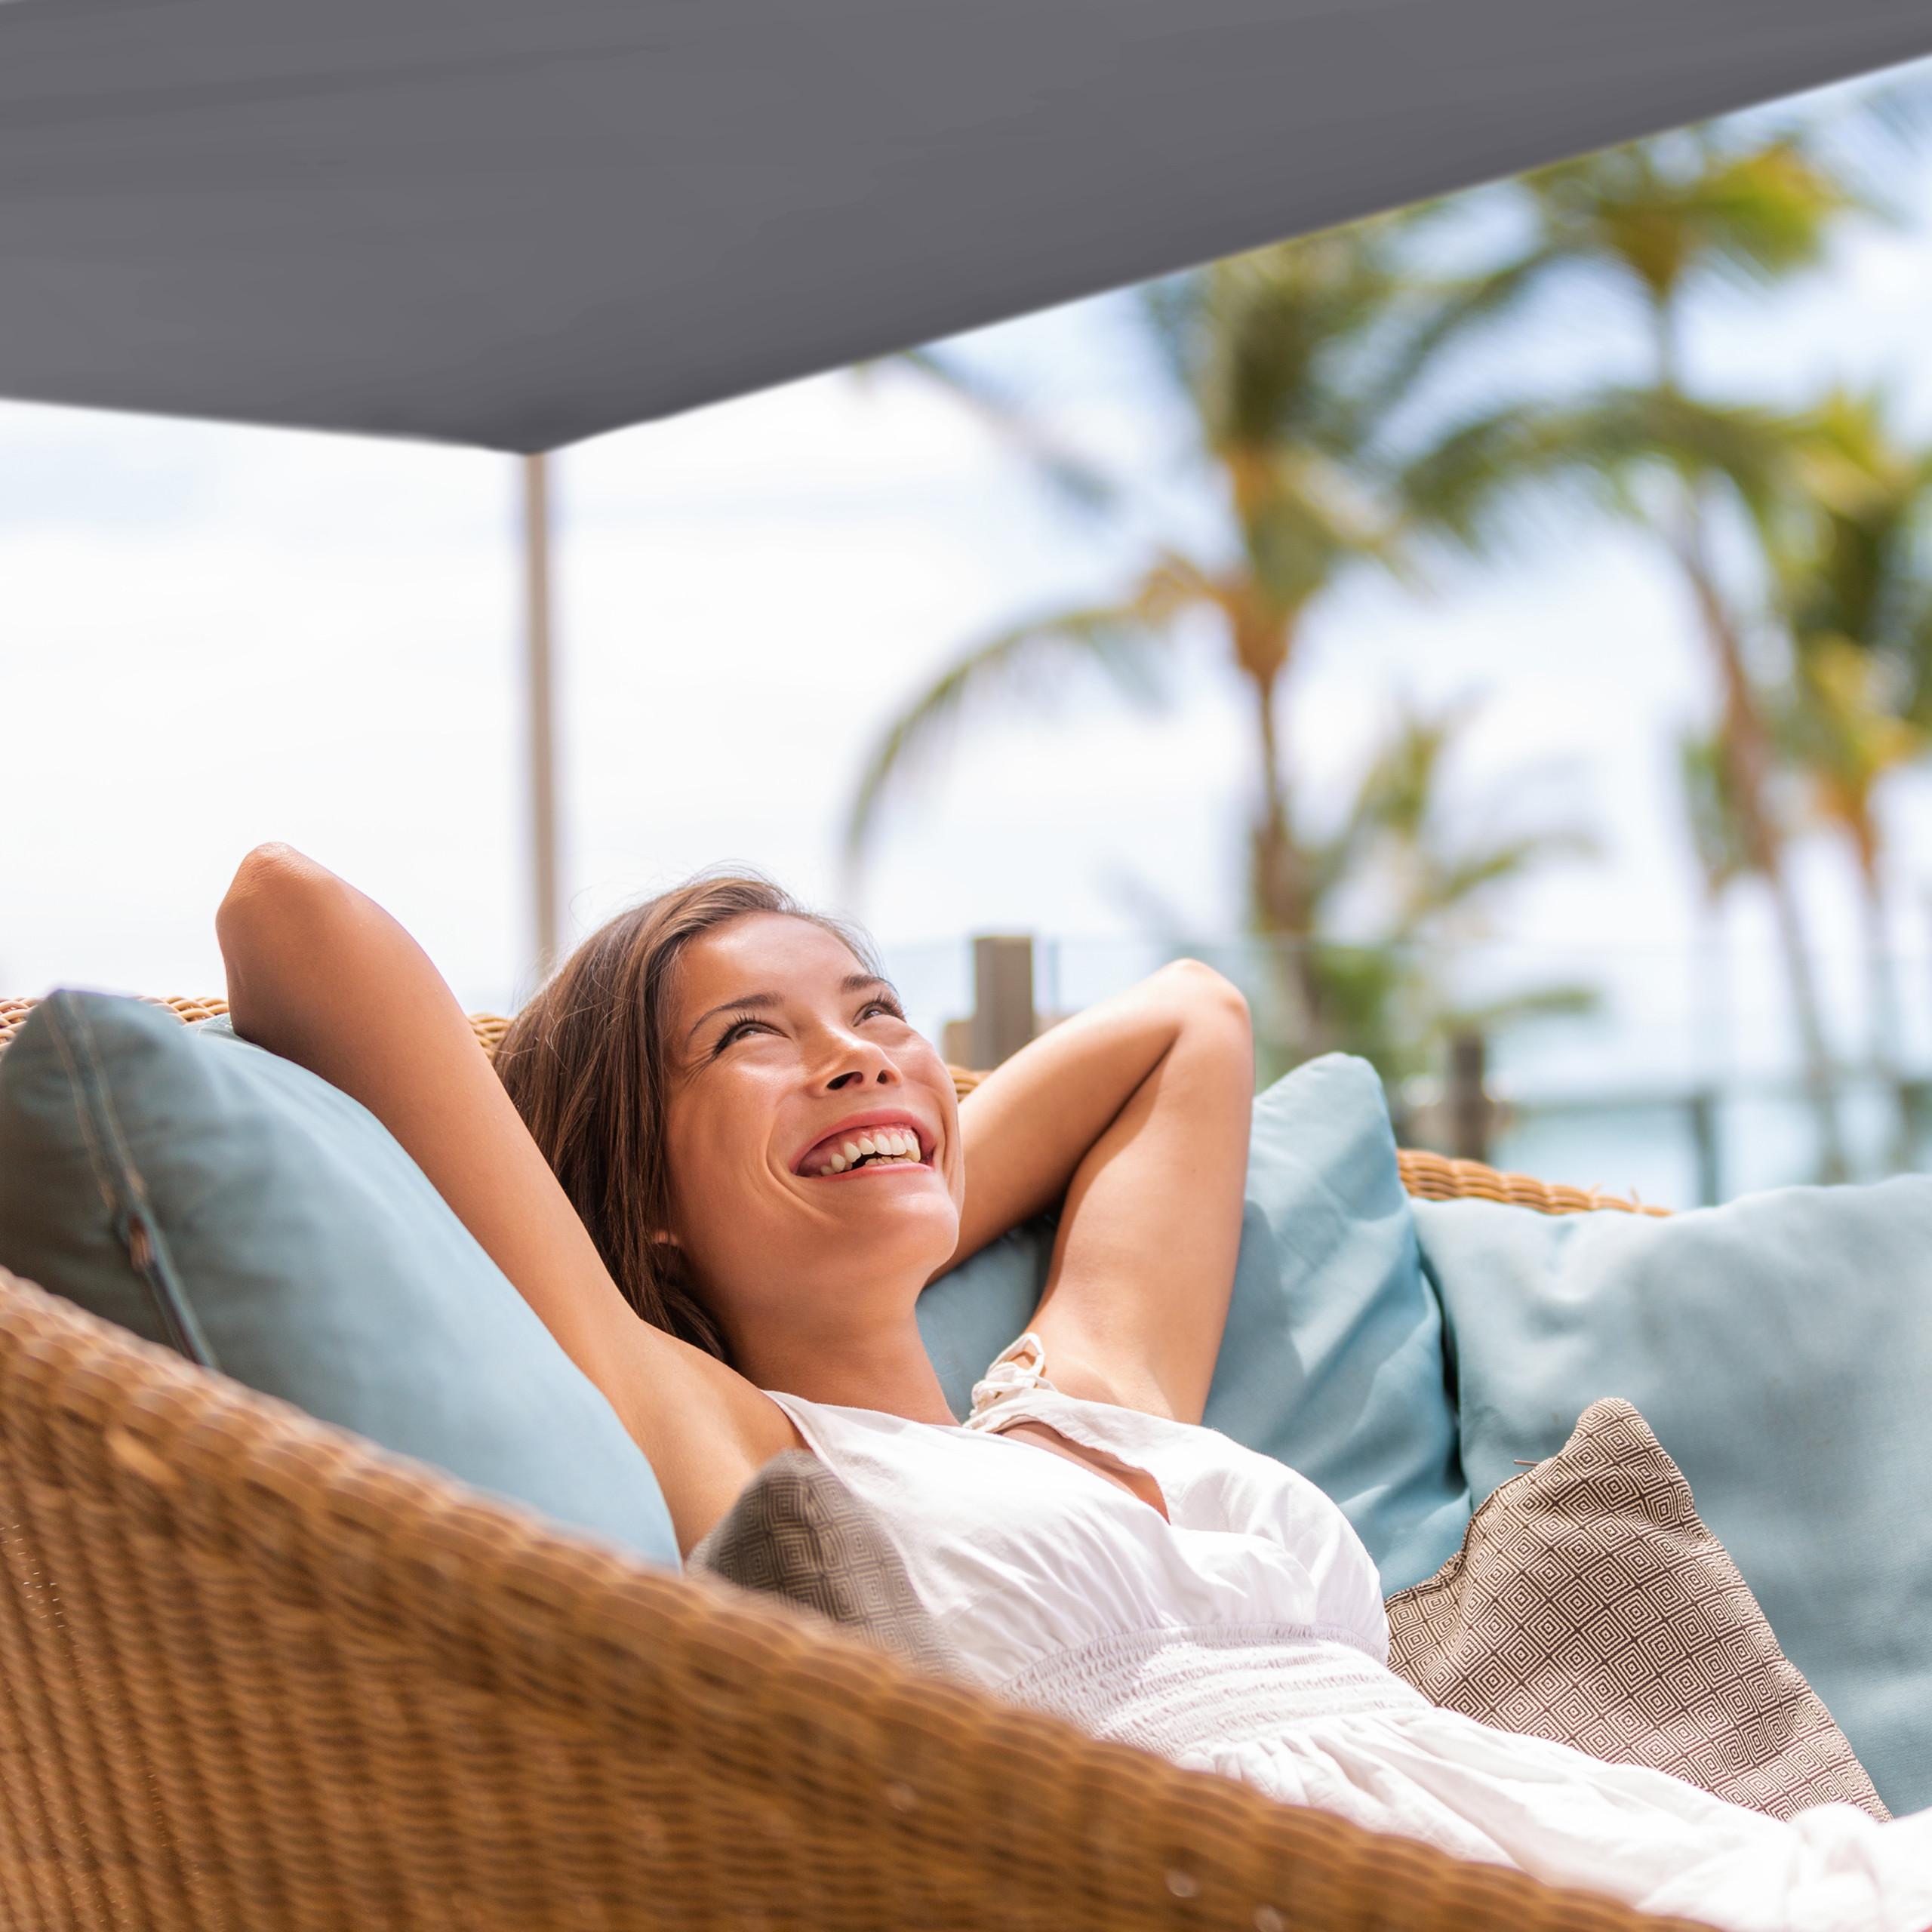 Sonnensegel Schattensegel Sonnenschutz Balkonsegel Schattenspender Trapez grau